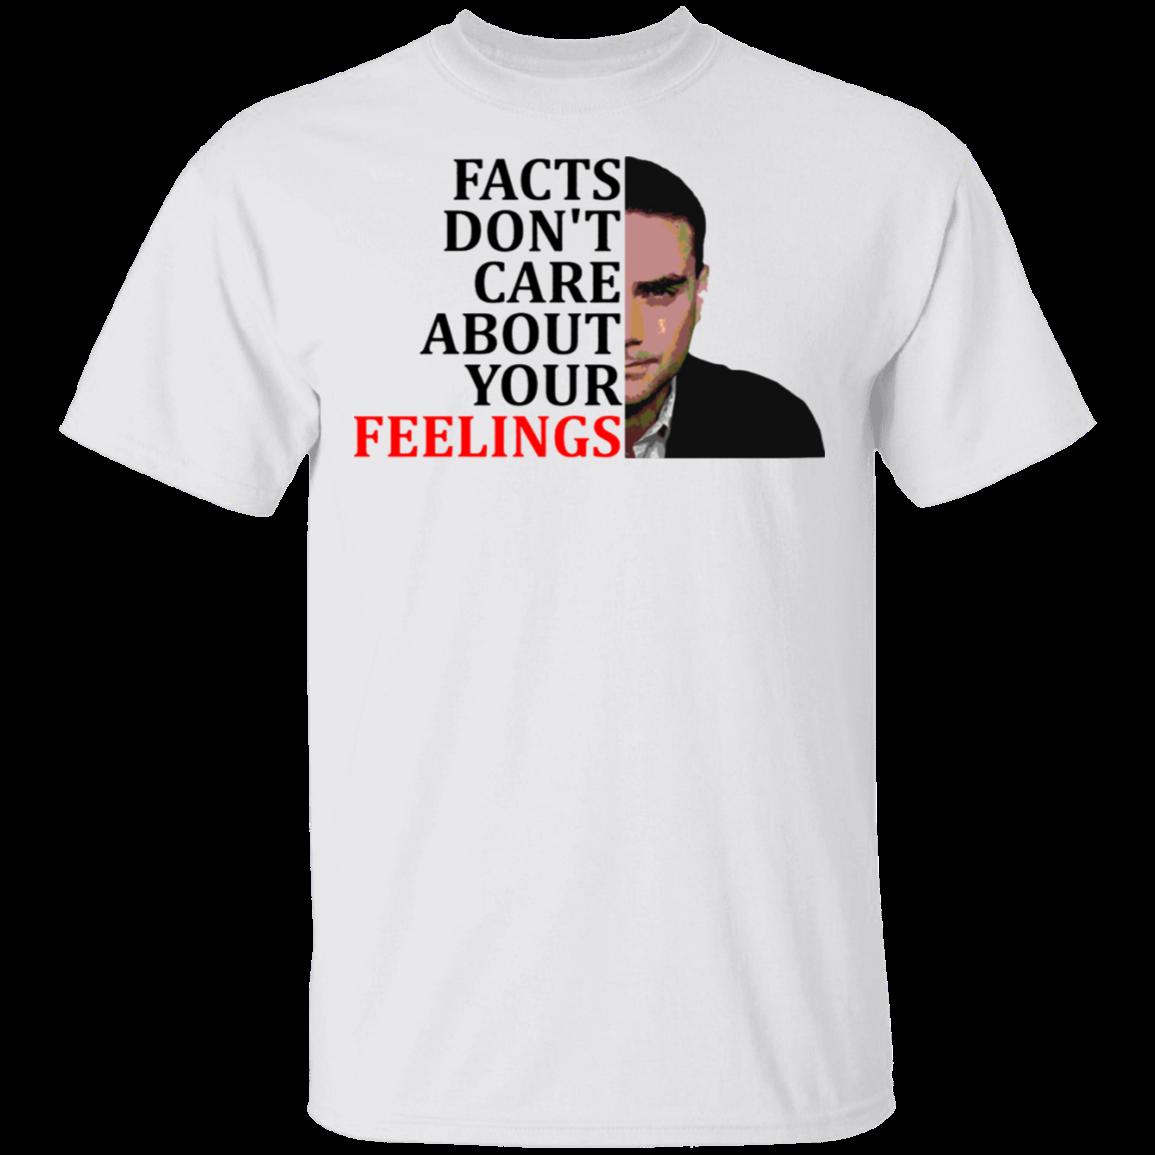 Ben Shapiro Facts Don T Care About Your Feelings Shirt Conservative Shirt Ben Shapiro Merch White L In 2021 Feeling Shirts Conservative Shirt Shirts With Sayings